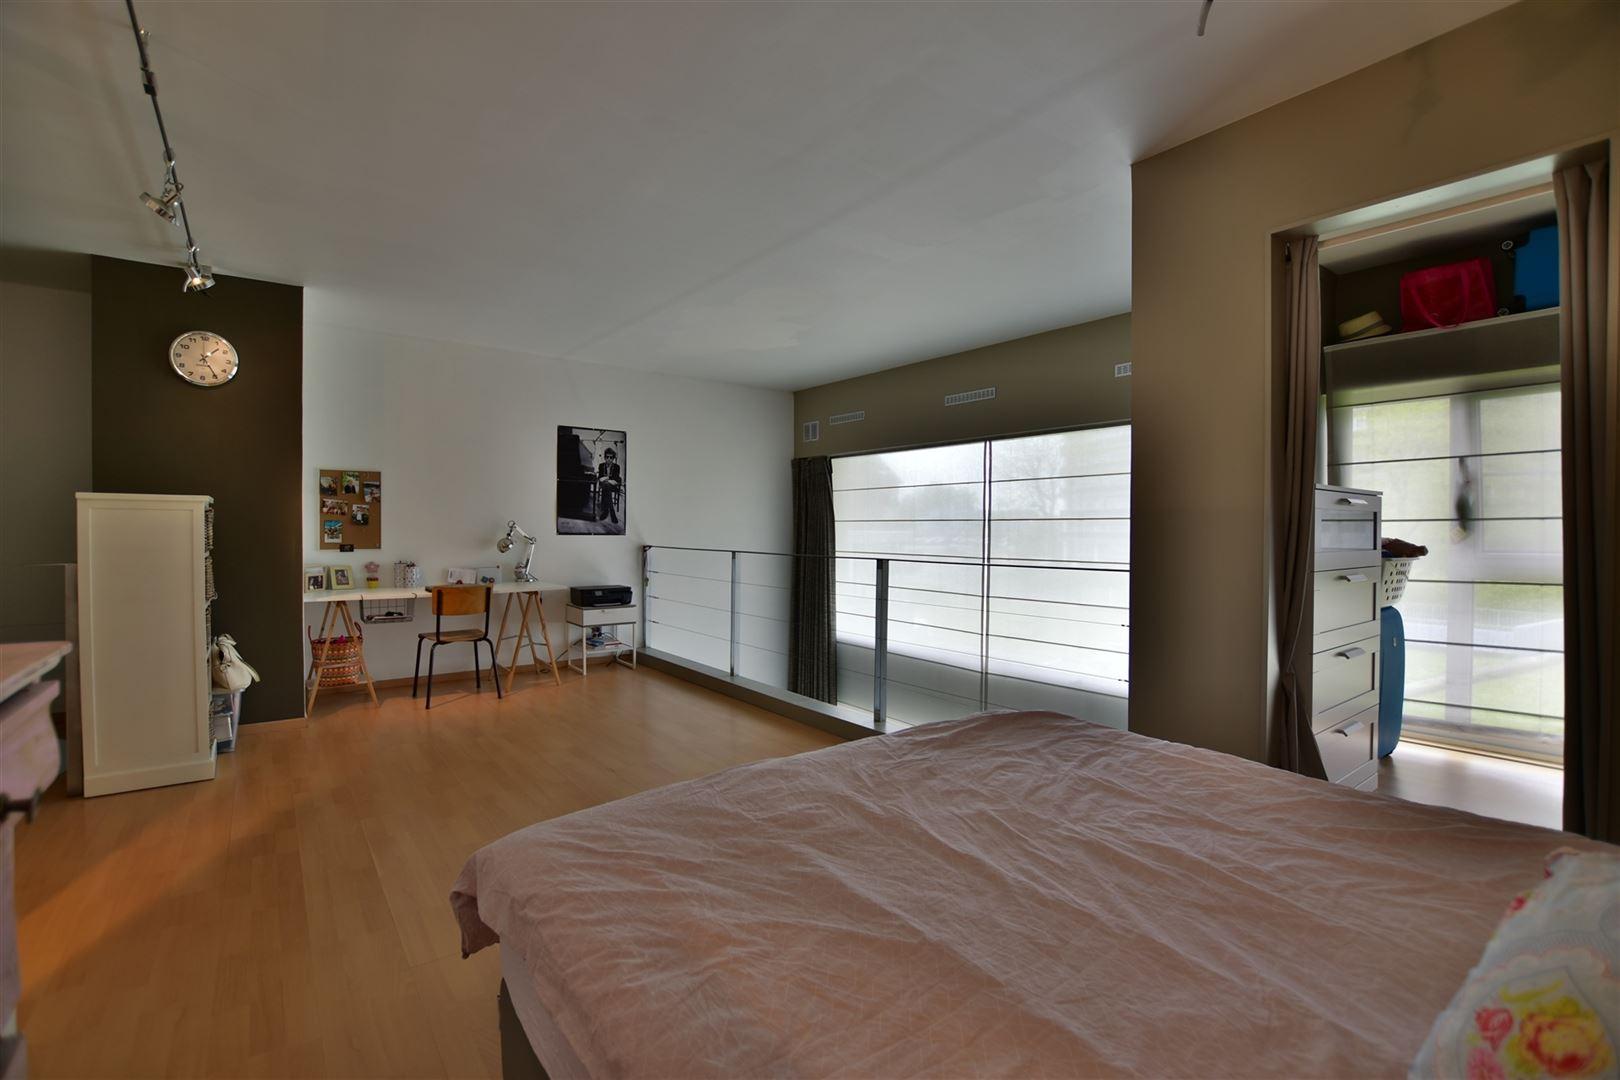 Foto 12 : Appartement te 9200 DENDERMONDE (België) - Prijs € 199.000